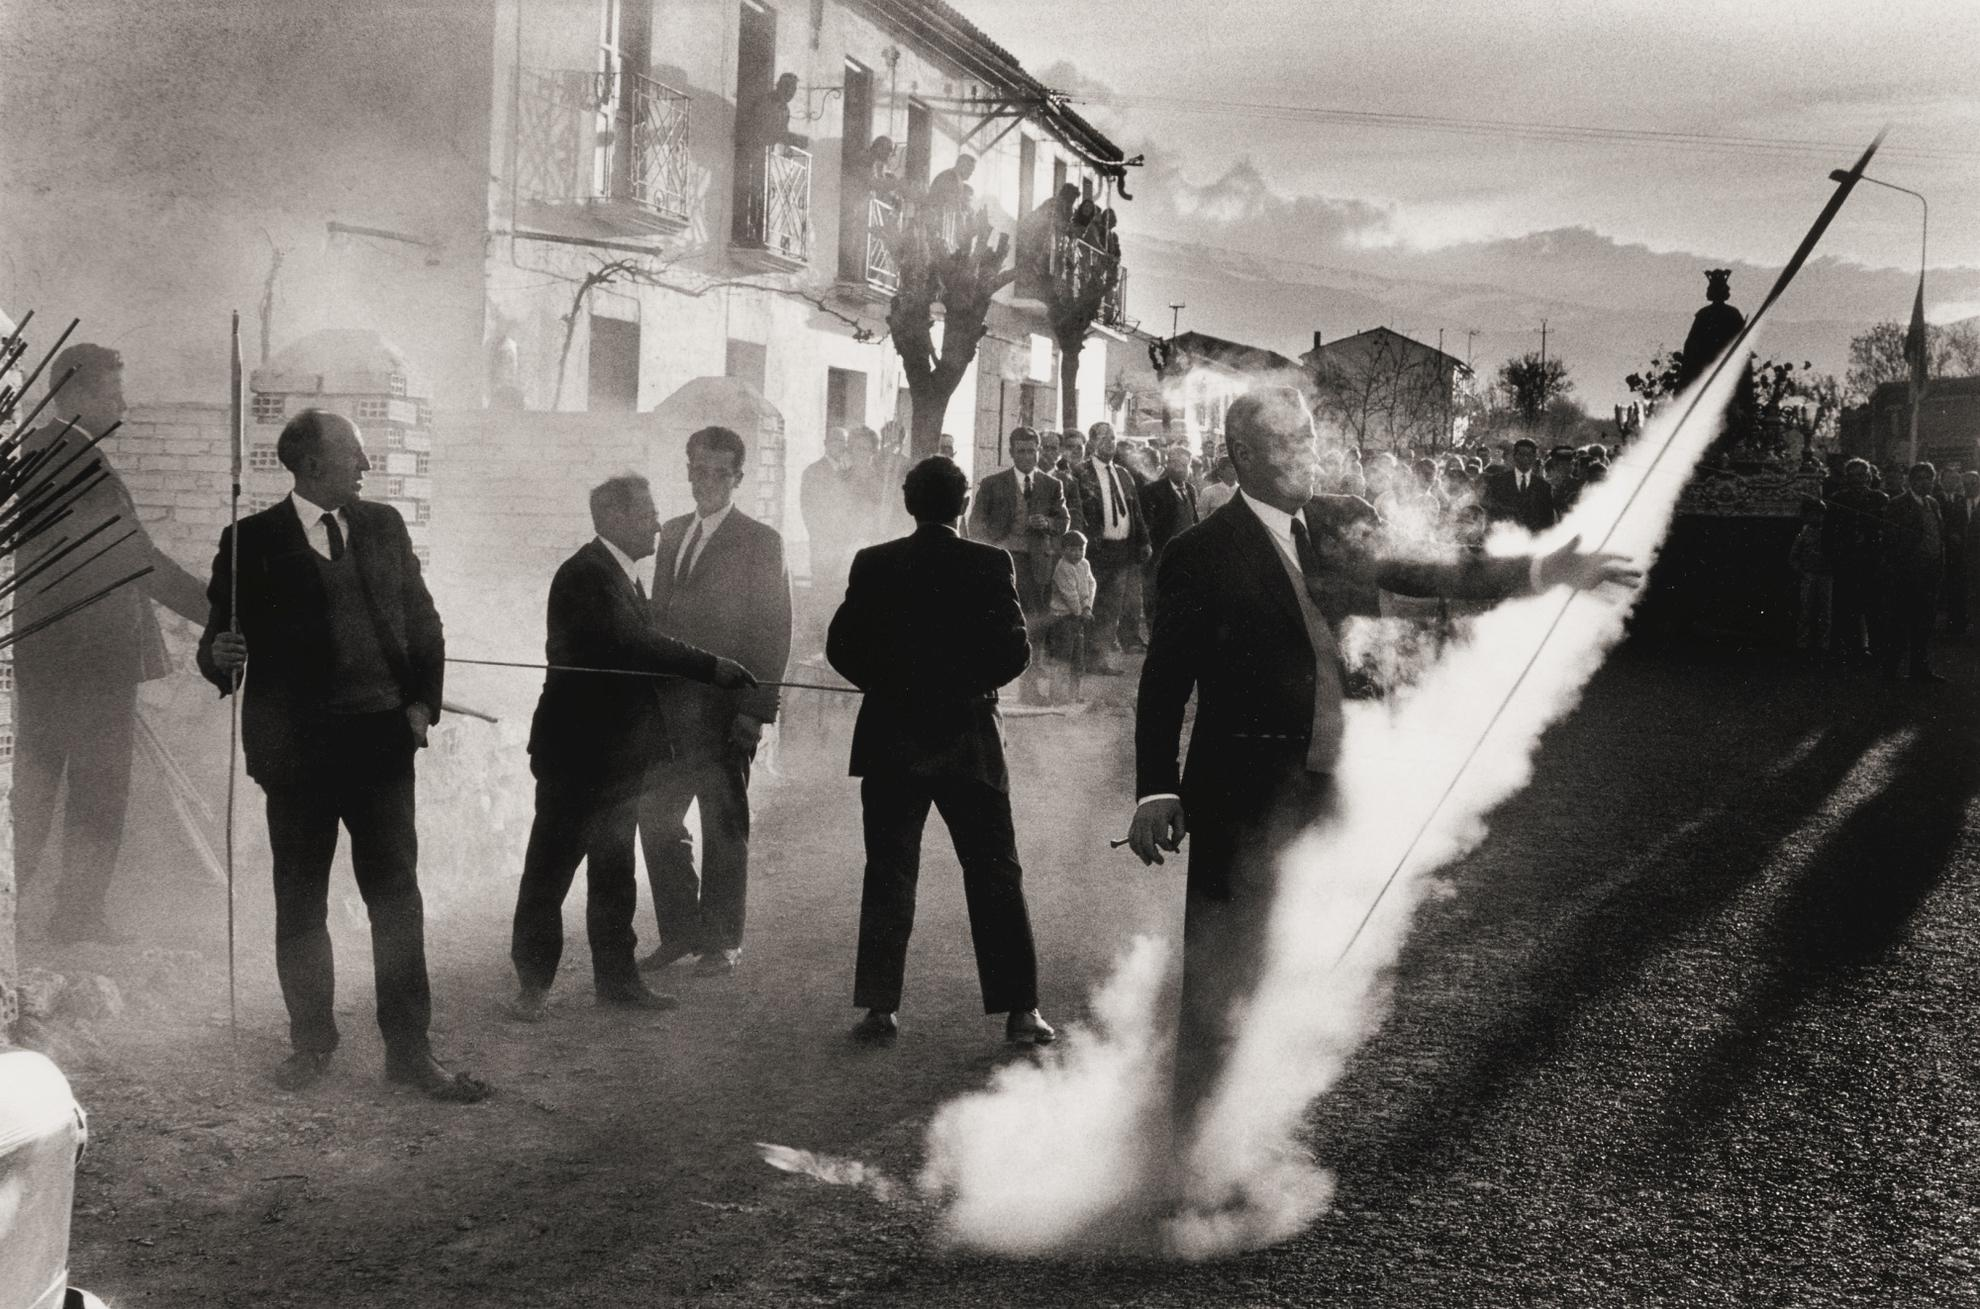 Josef Koudelka-Guadix, Andalucia, Spain-1971